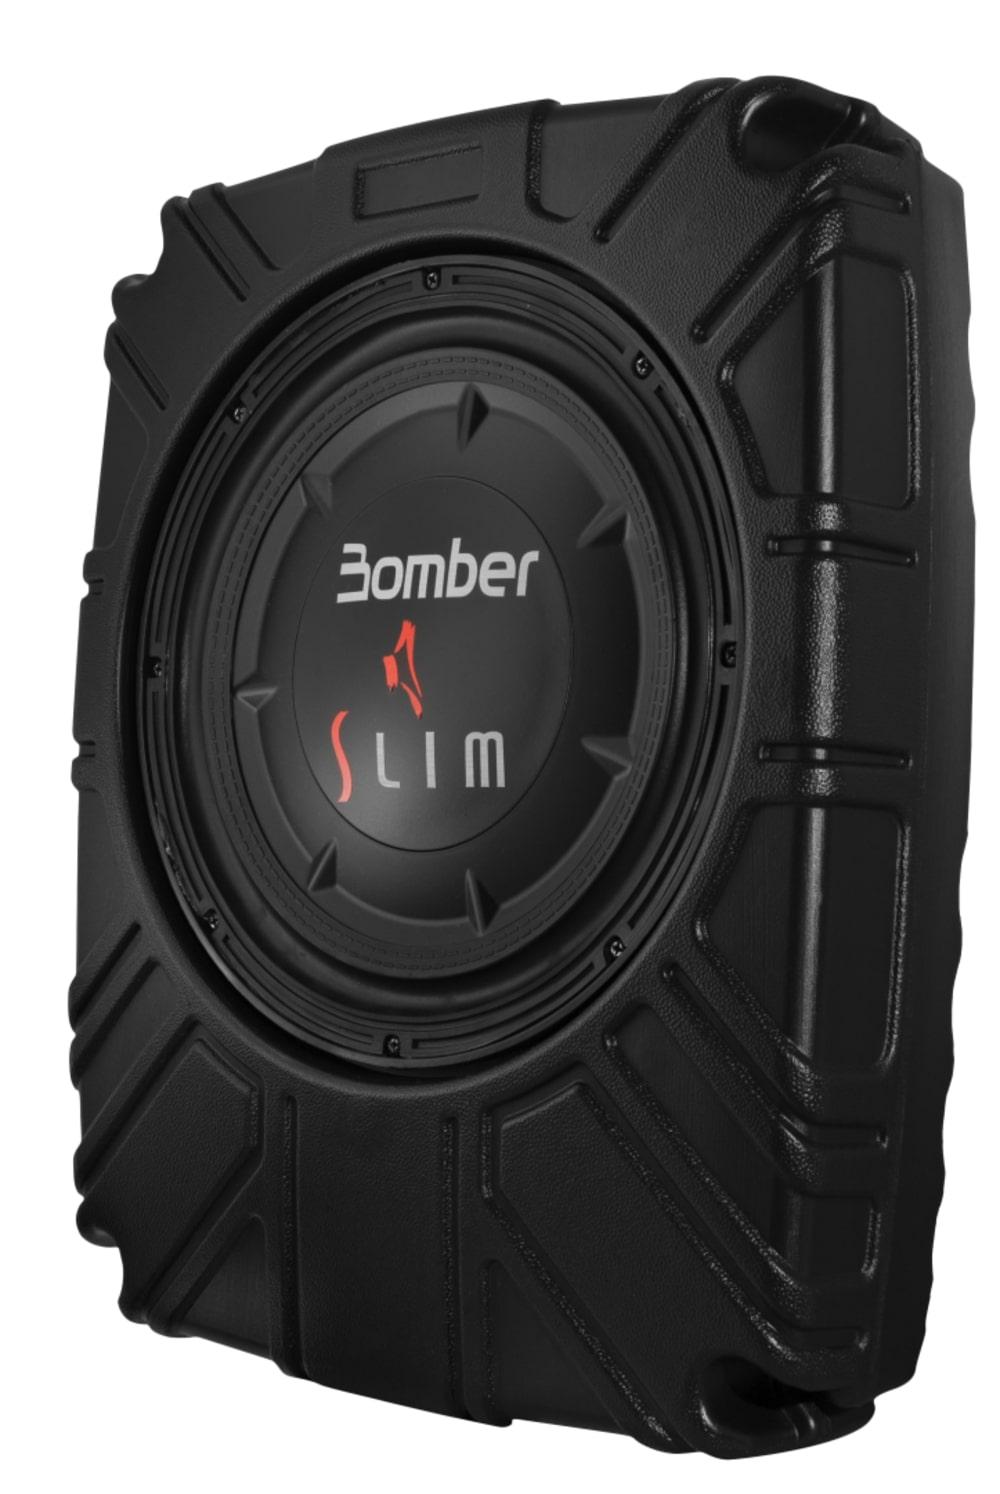 Caixa Bomber Slim  10